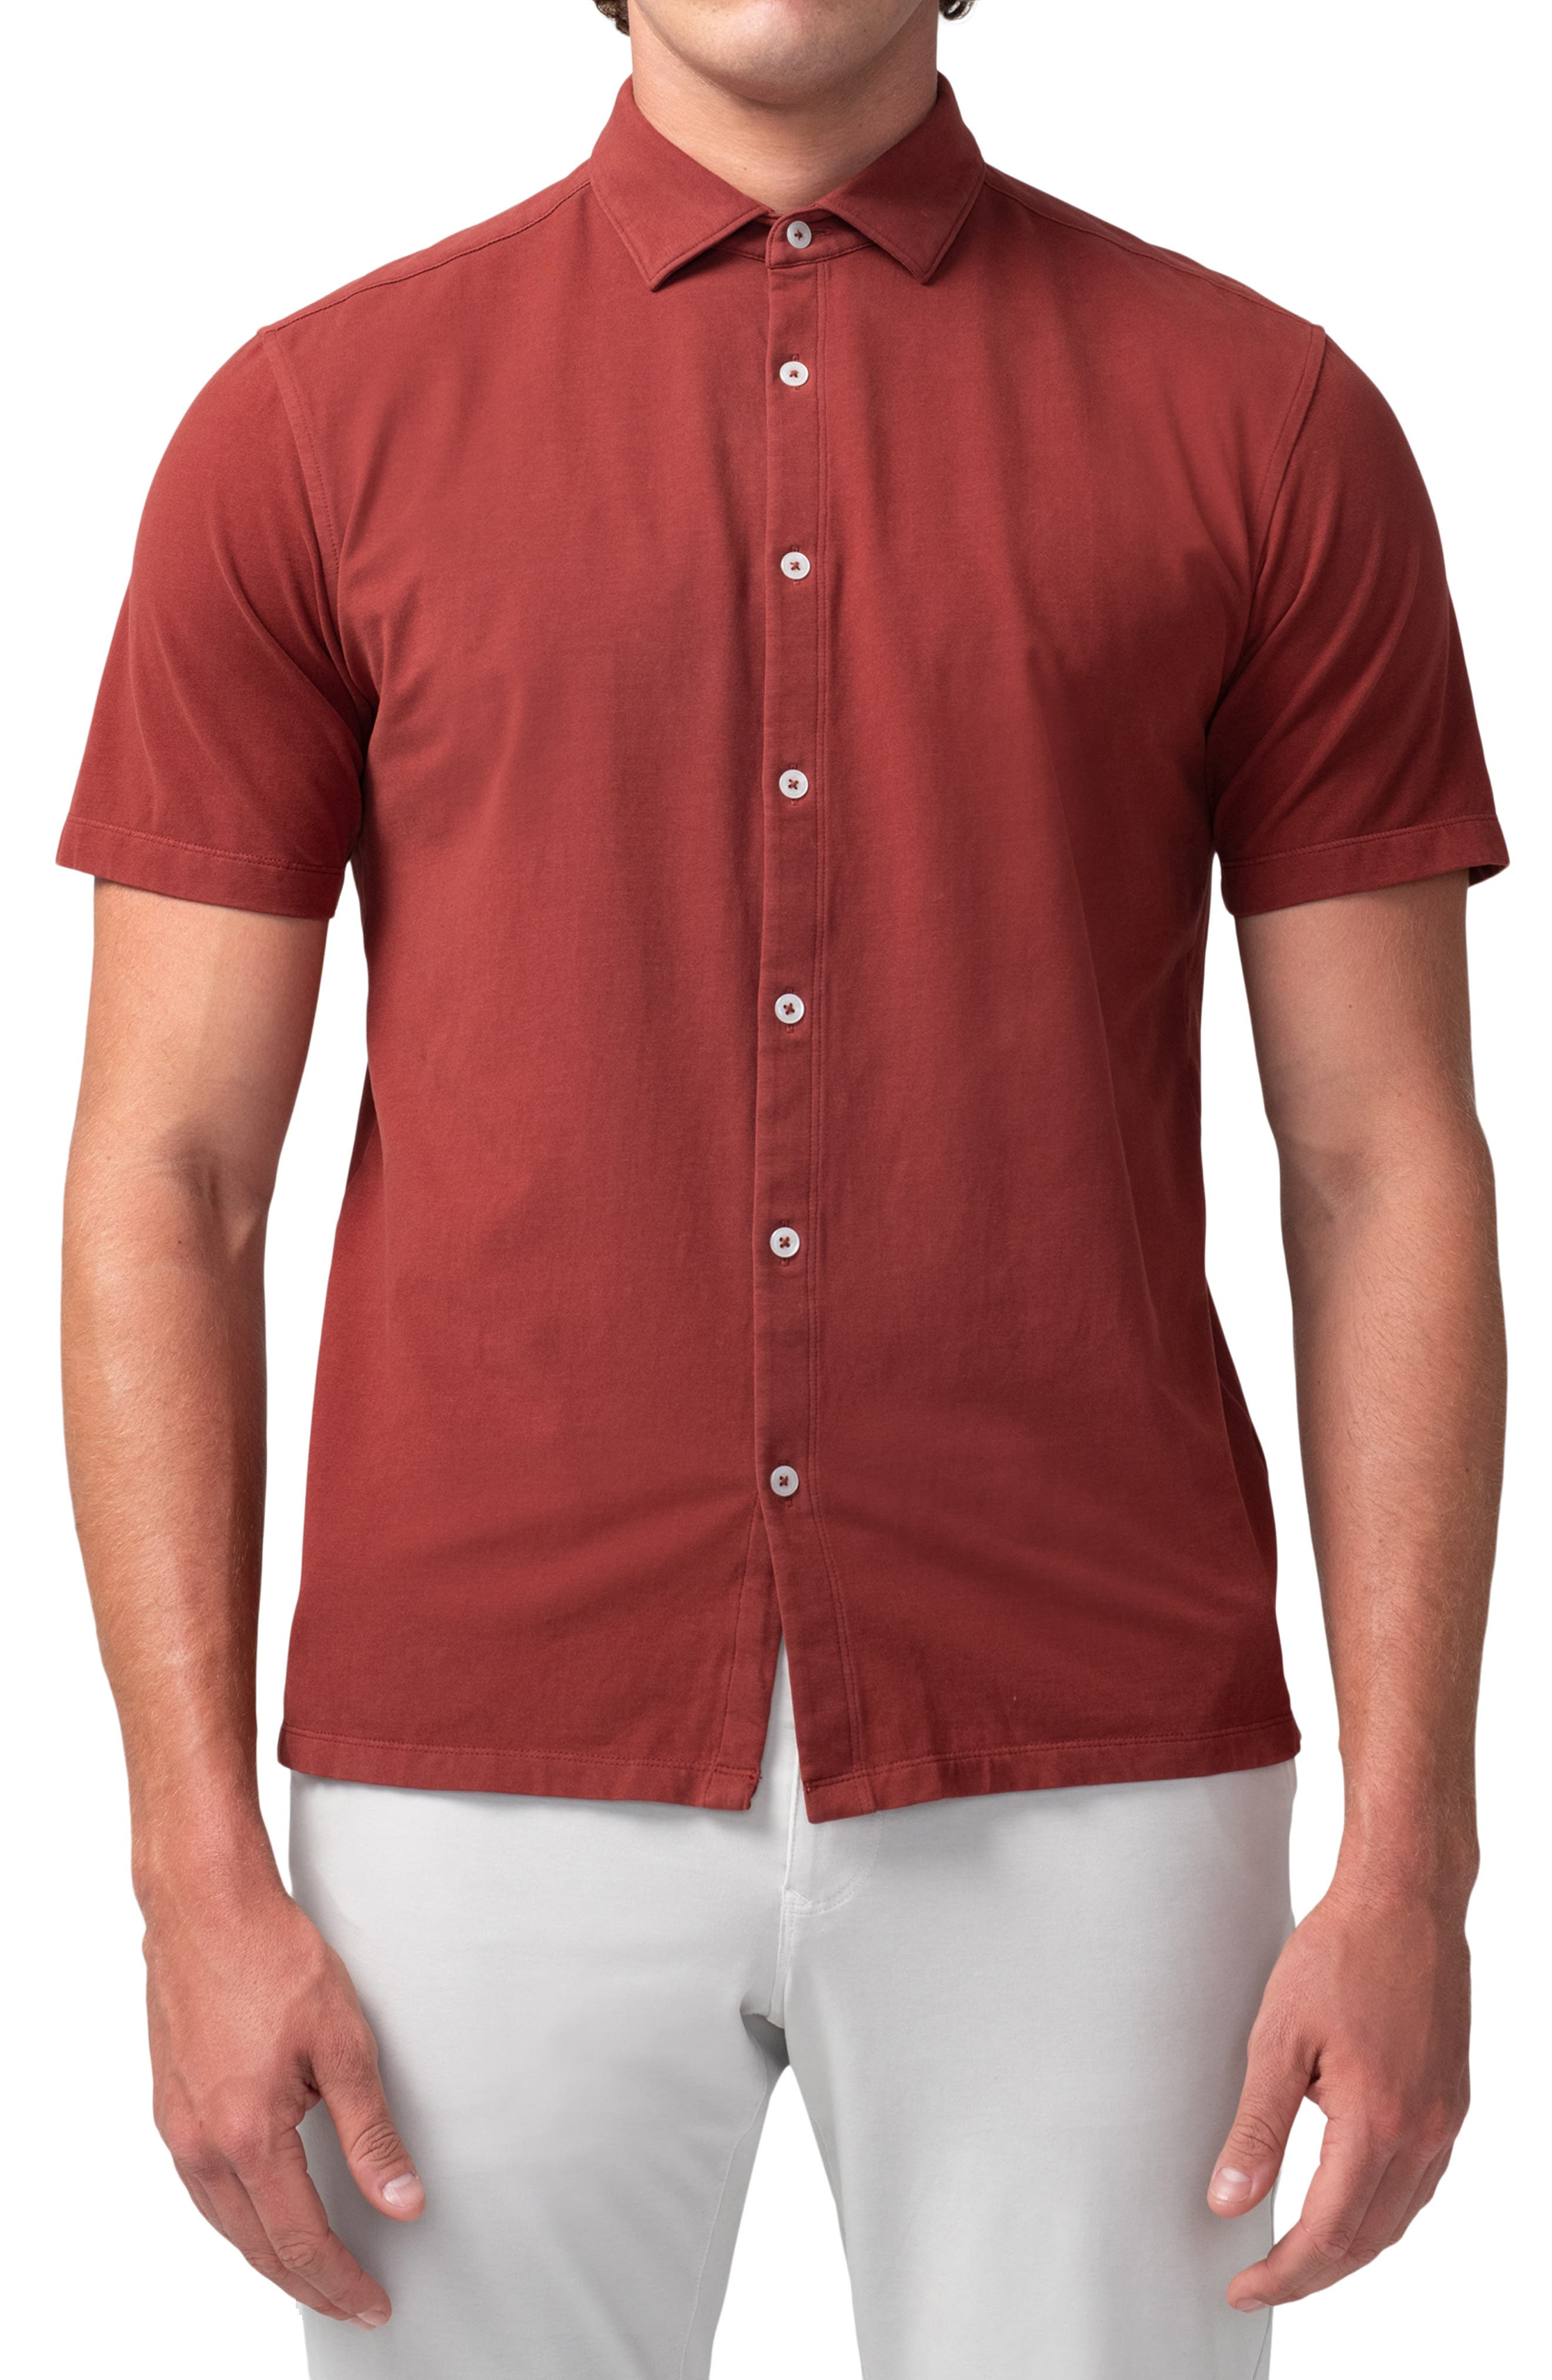 Flex Pro Lite Short Sleeve Stretch Cotton Button-Up Shirt